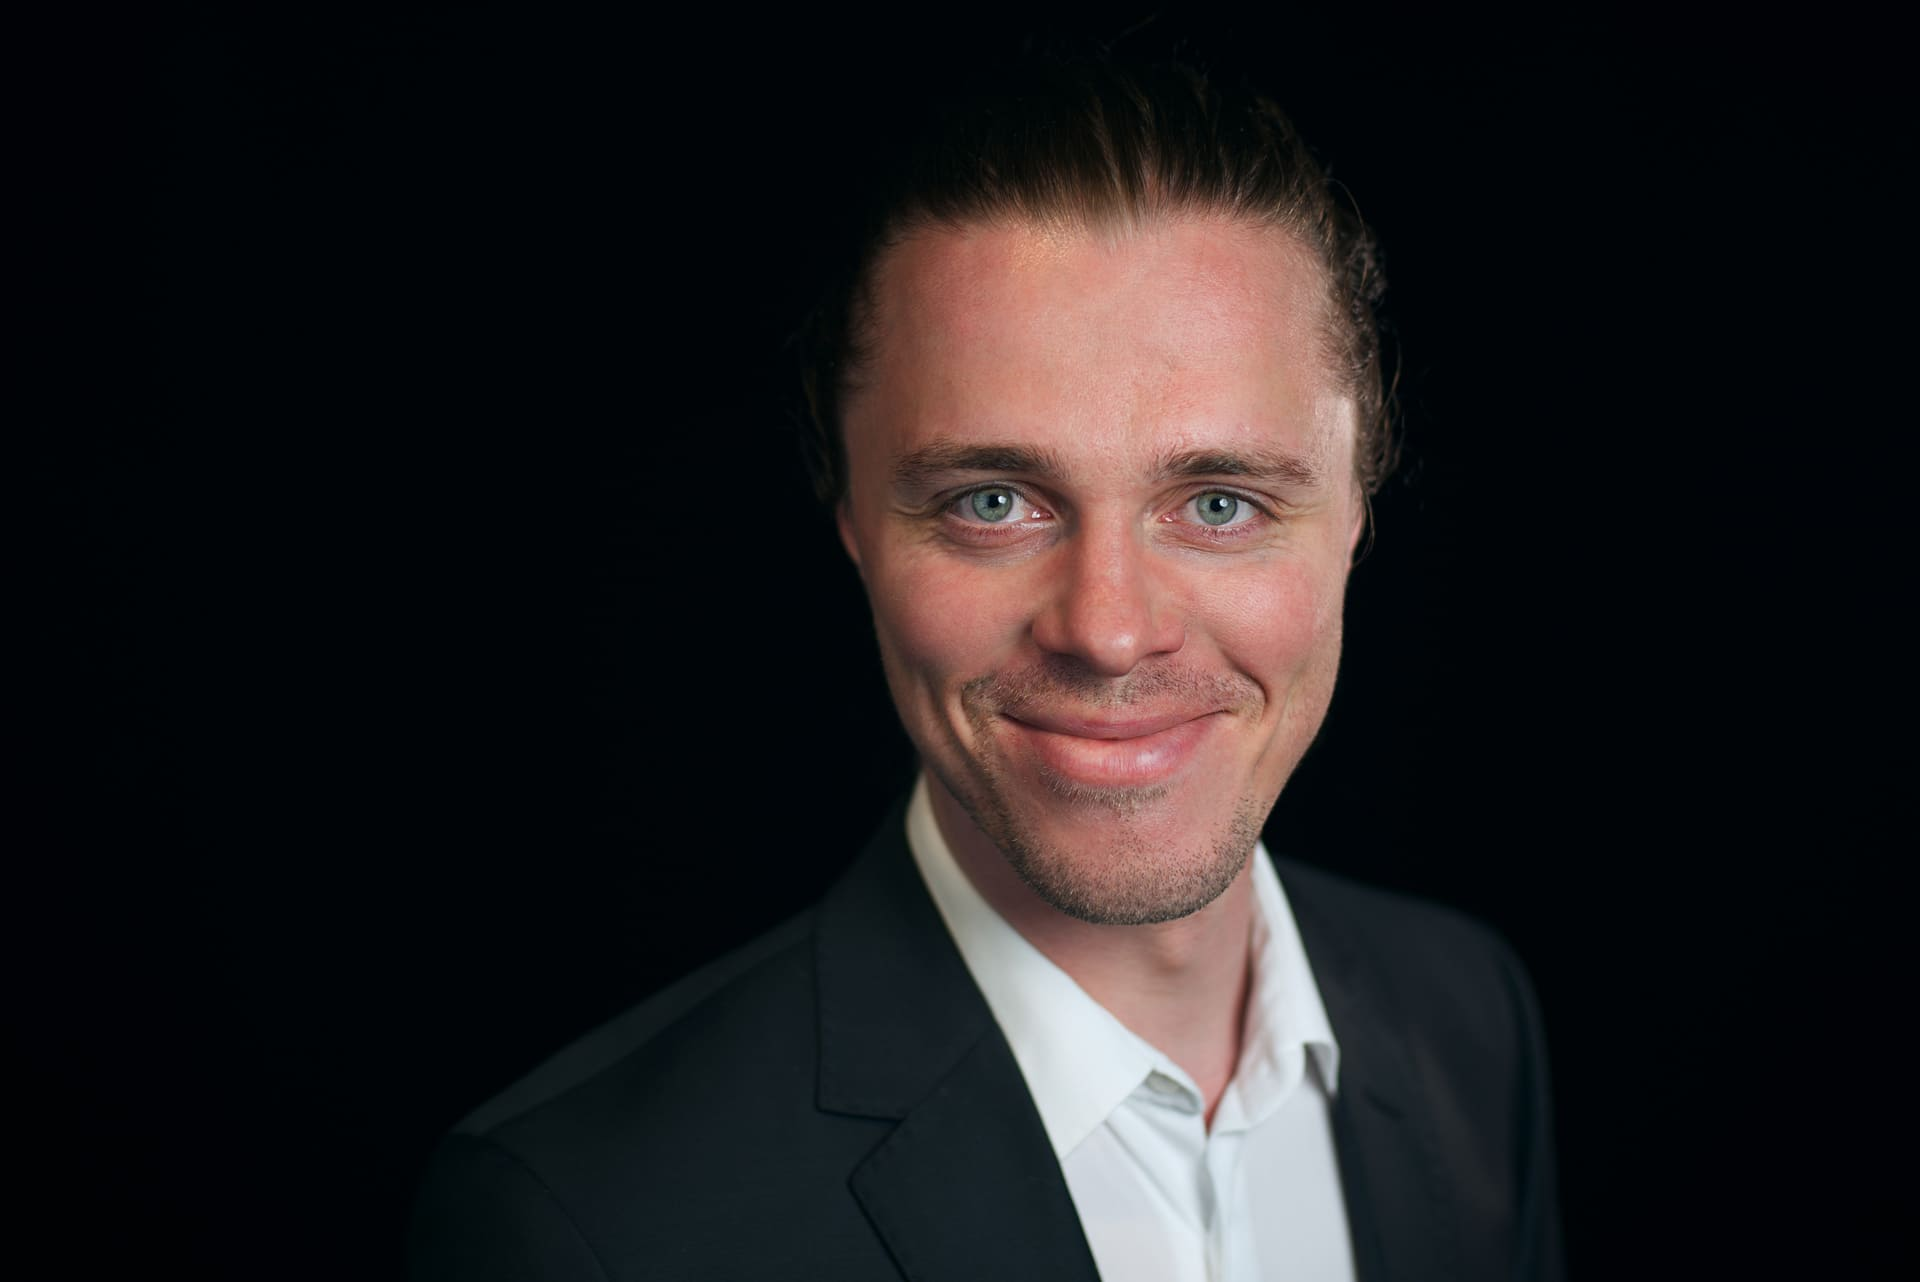 David Risberg 3 - photo by Helgi Reynisson